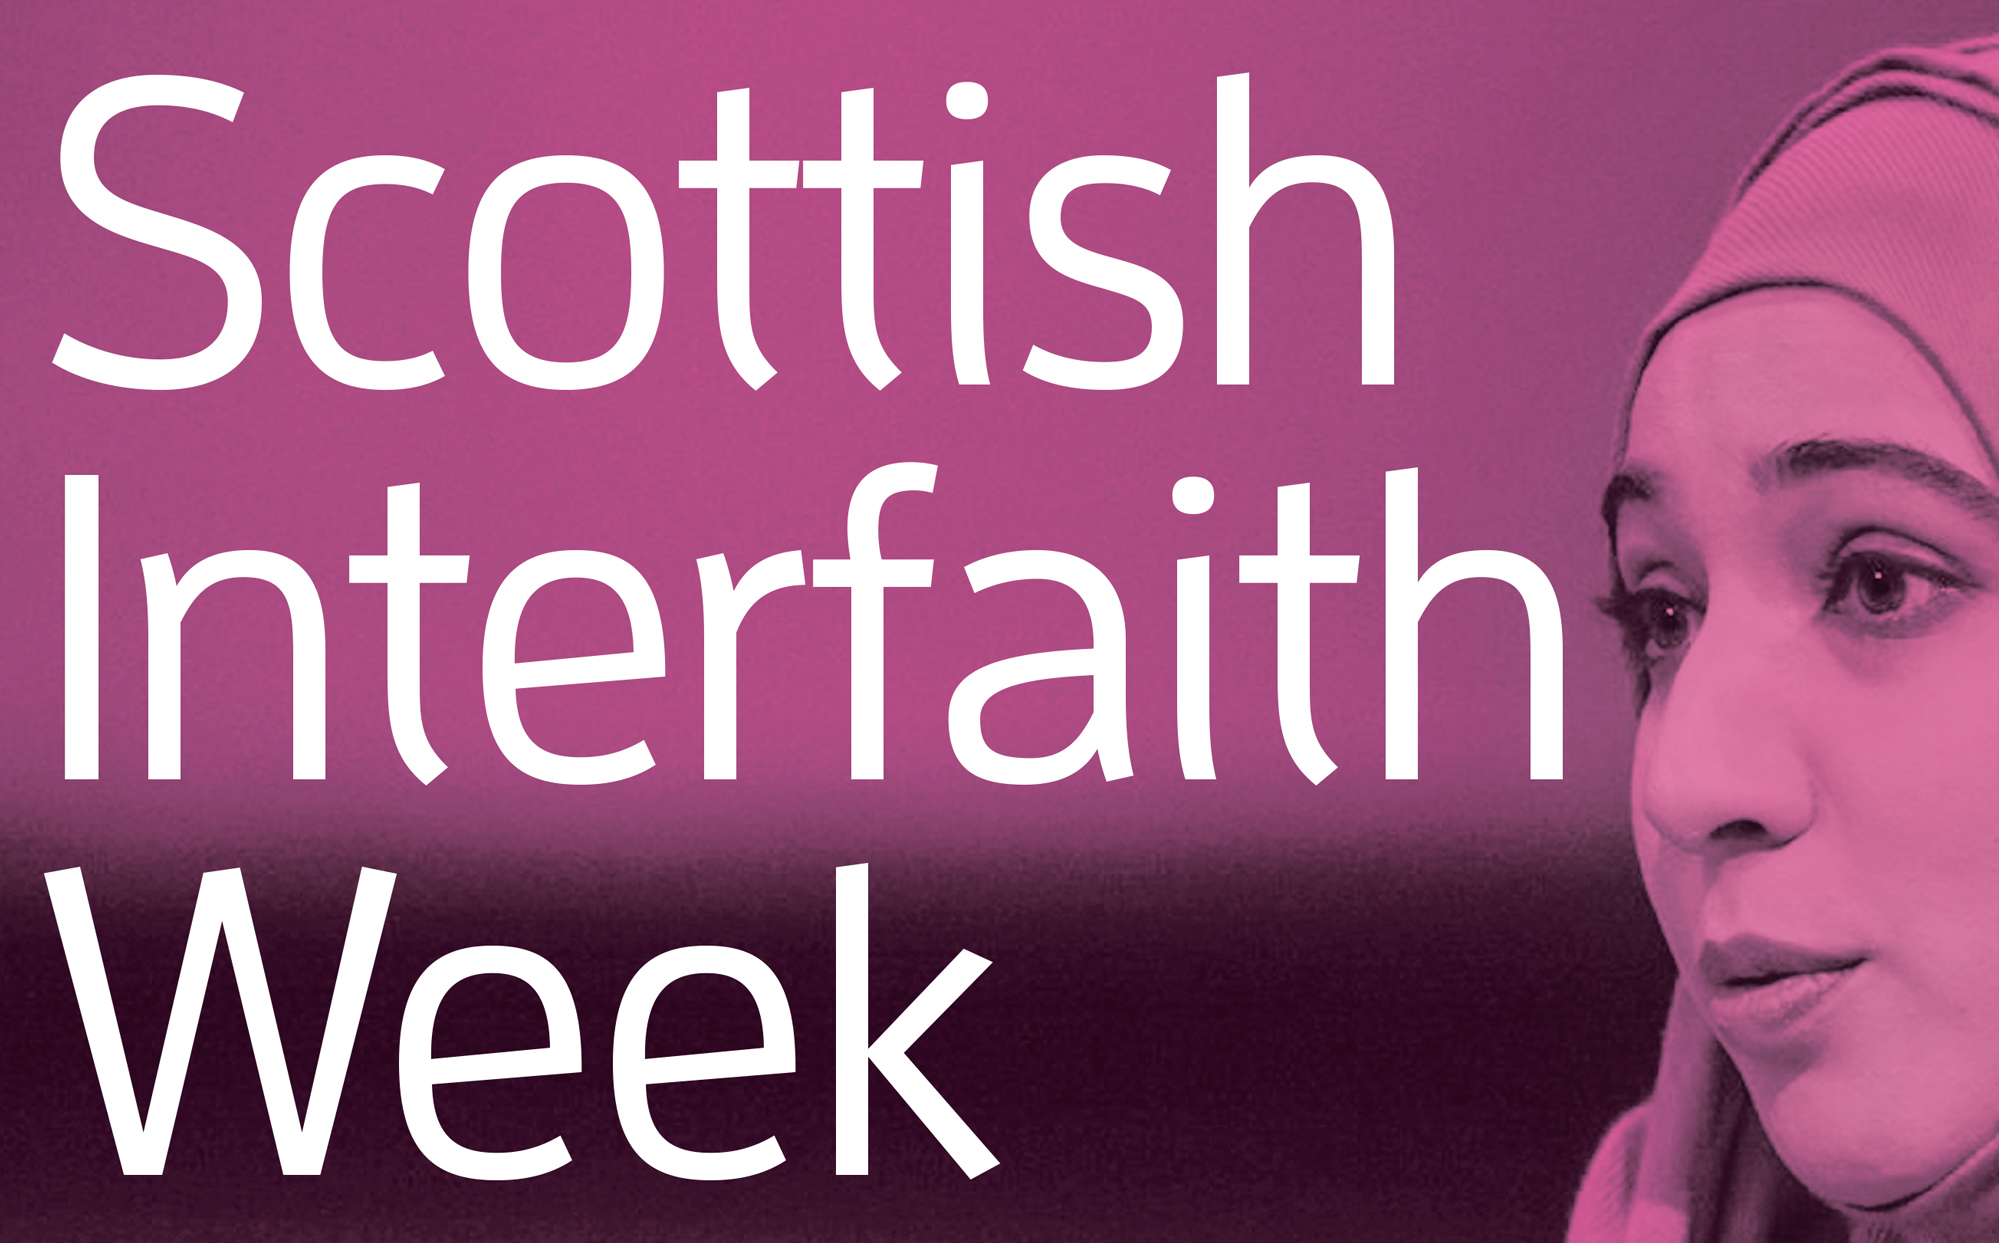 Scottish Interfaith Week